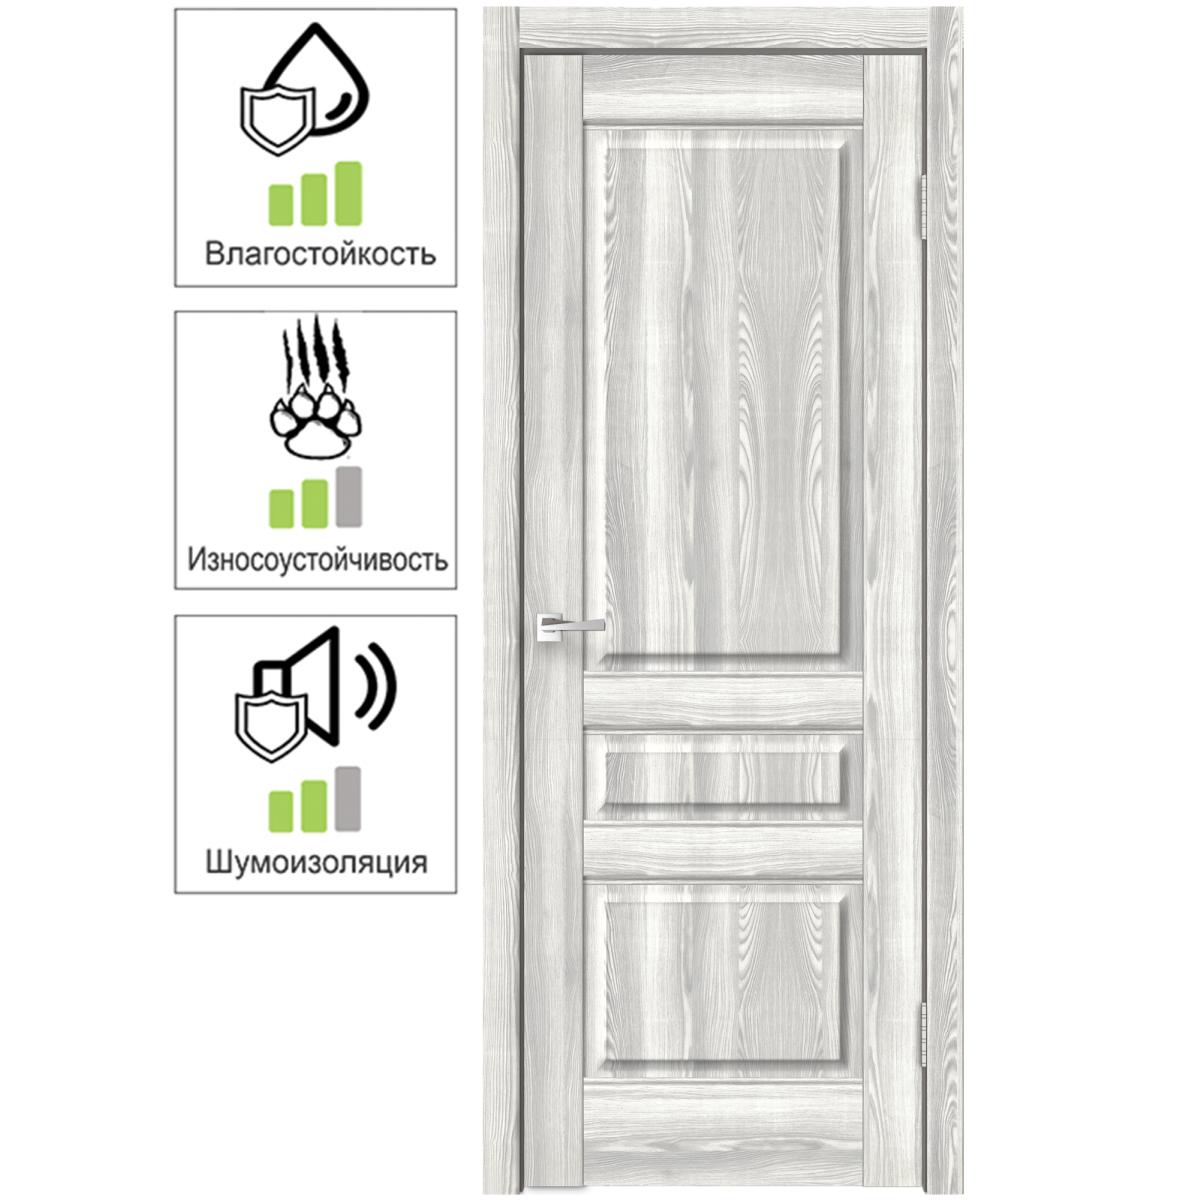 Дверь межкомнатная Летиция 60х200 см с фурнитурой ПВХ цвет клен